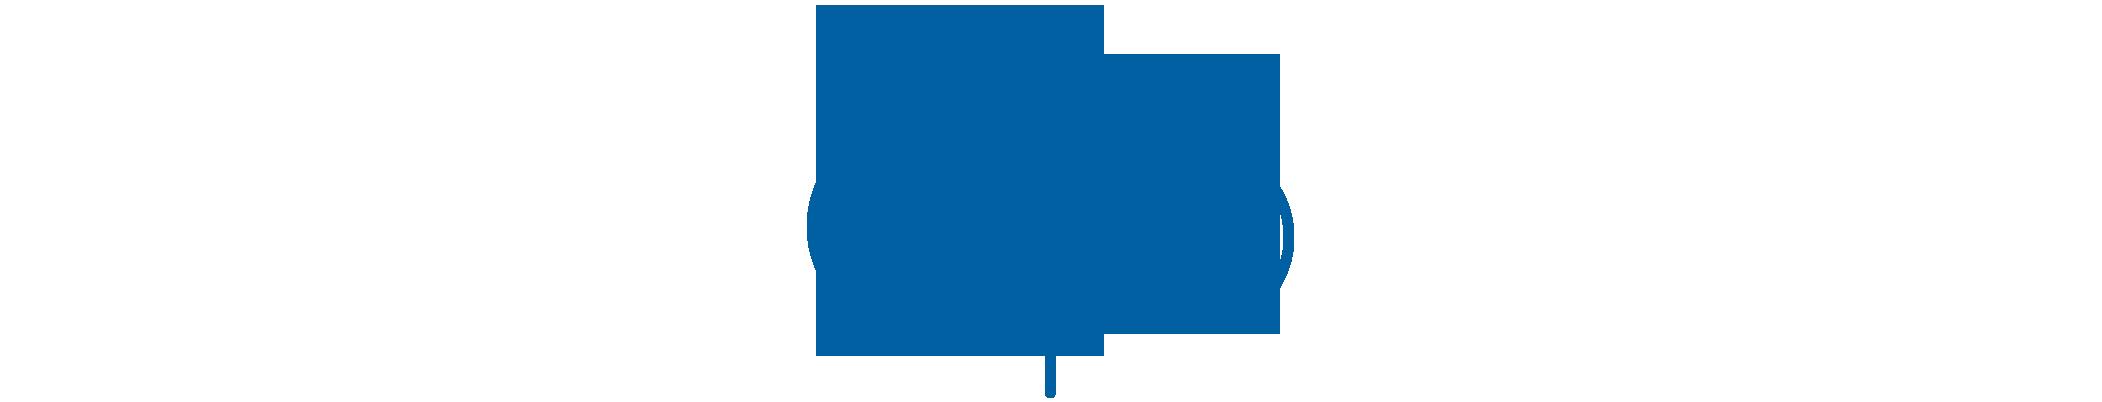 cloud-icone